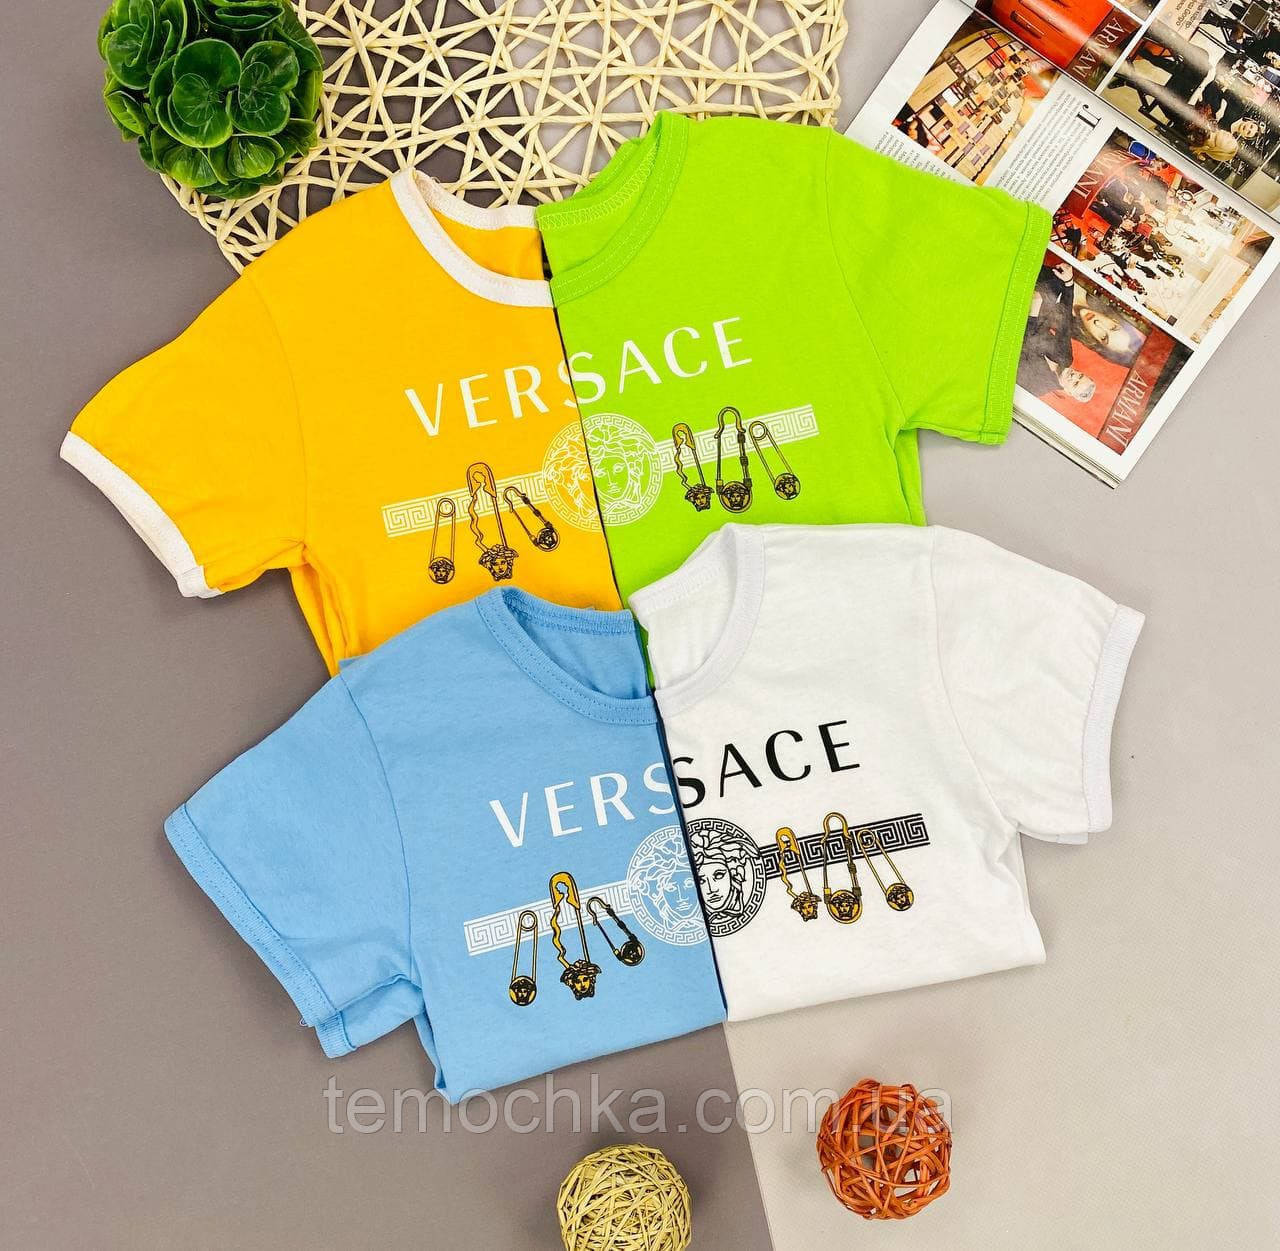 Стильна футболка на літо для хлопчика або дівчинки Версаче